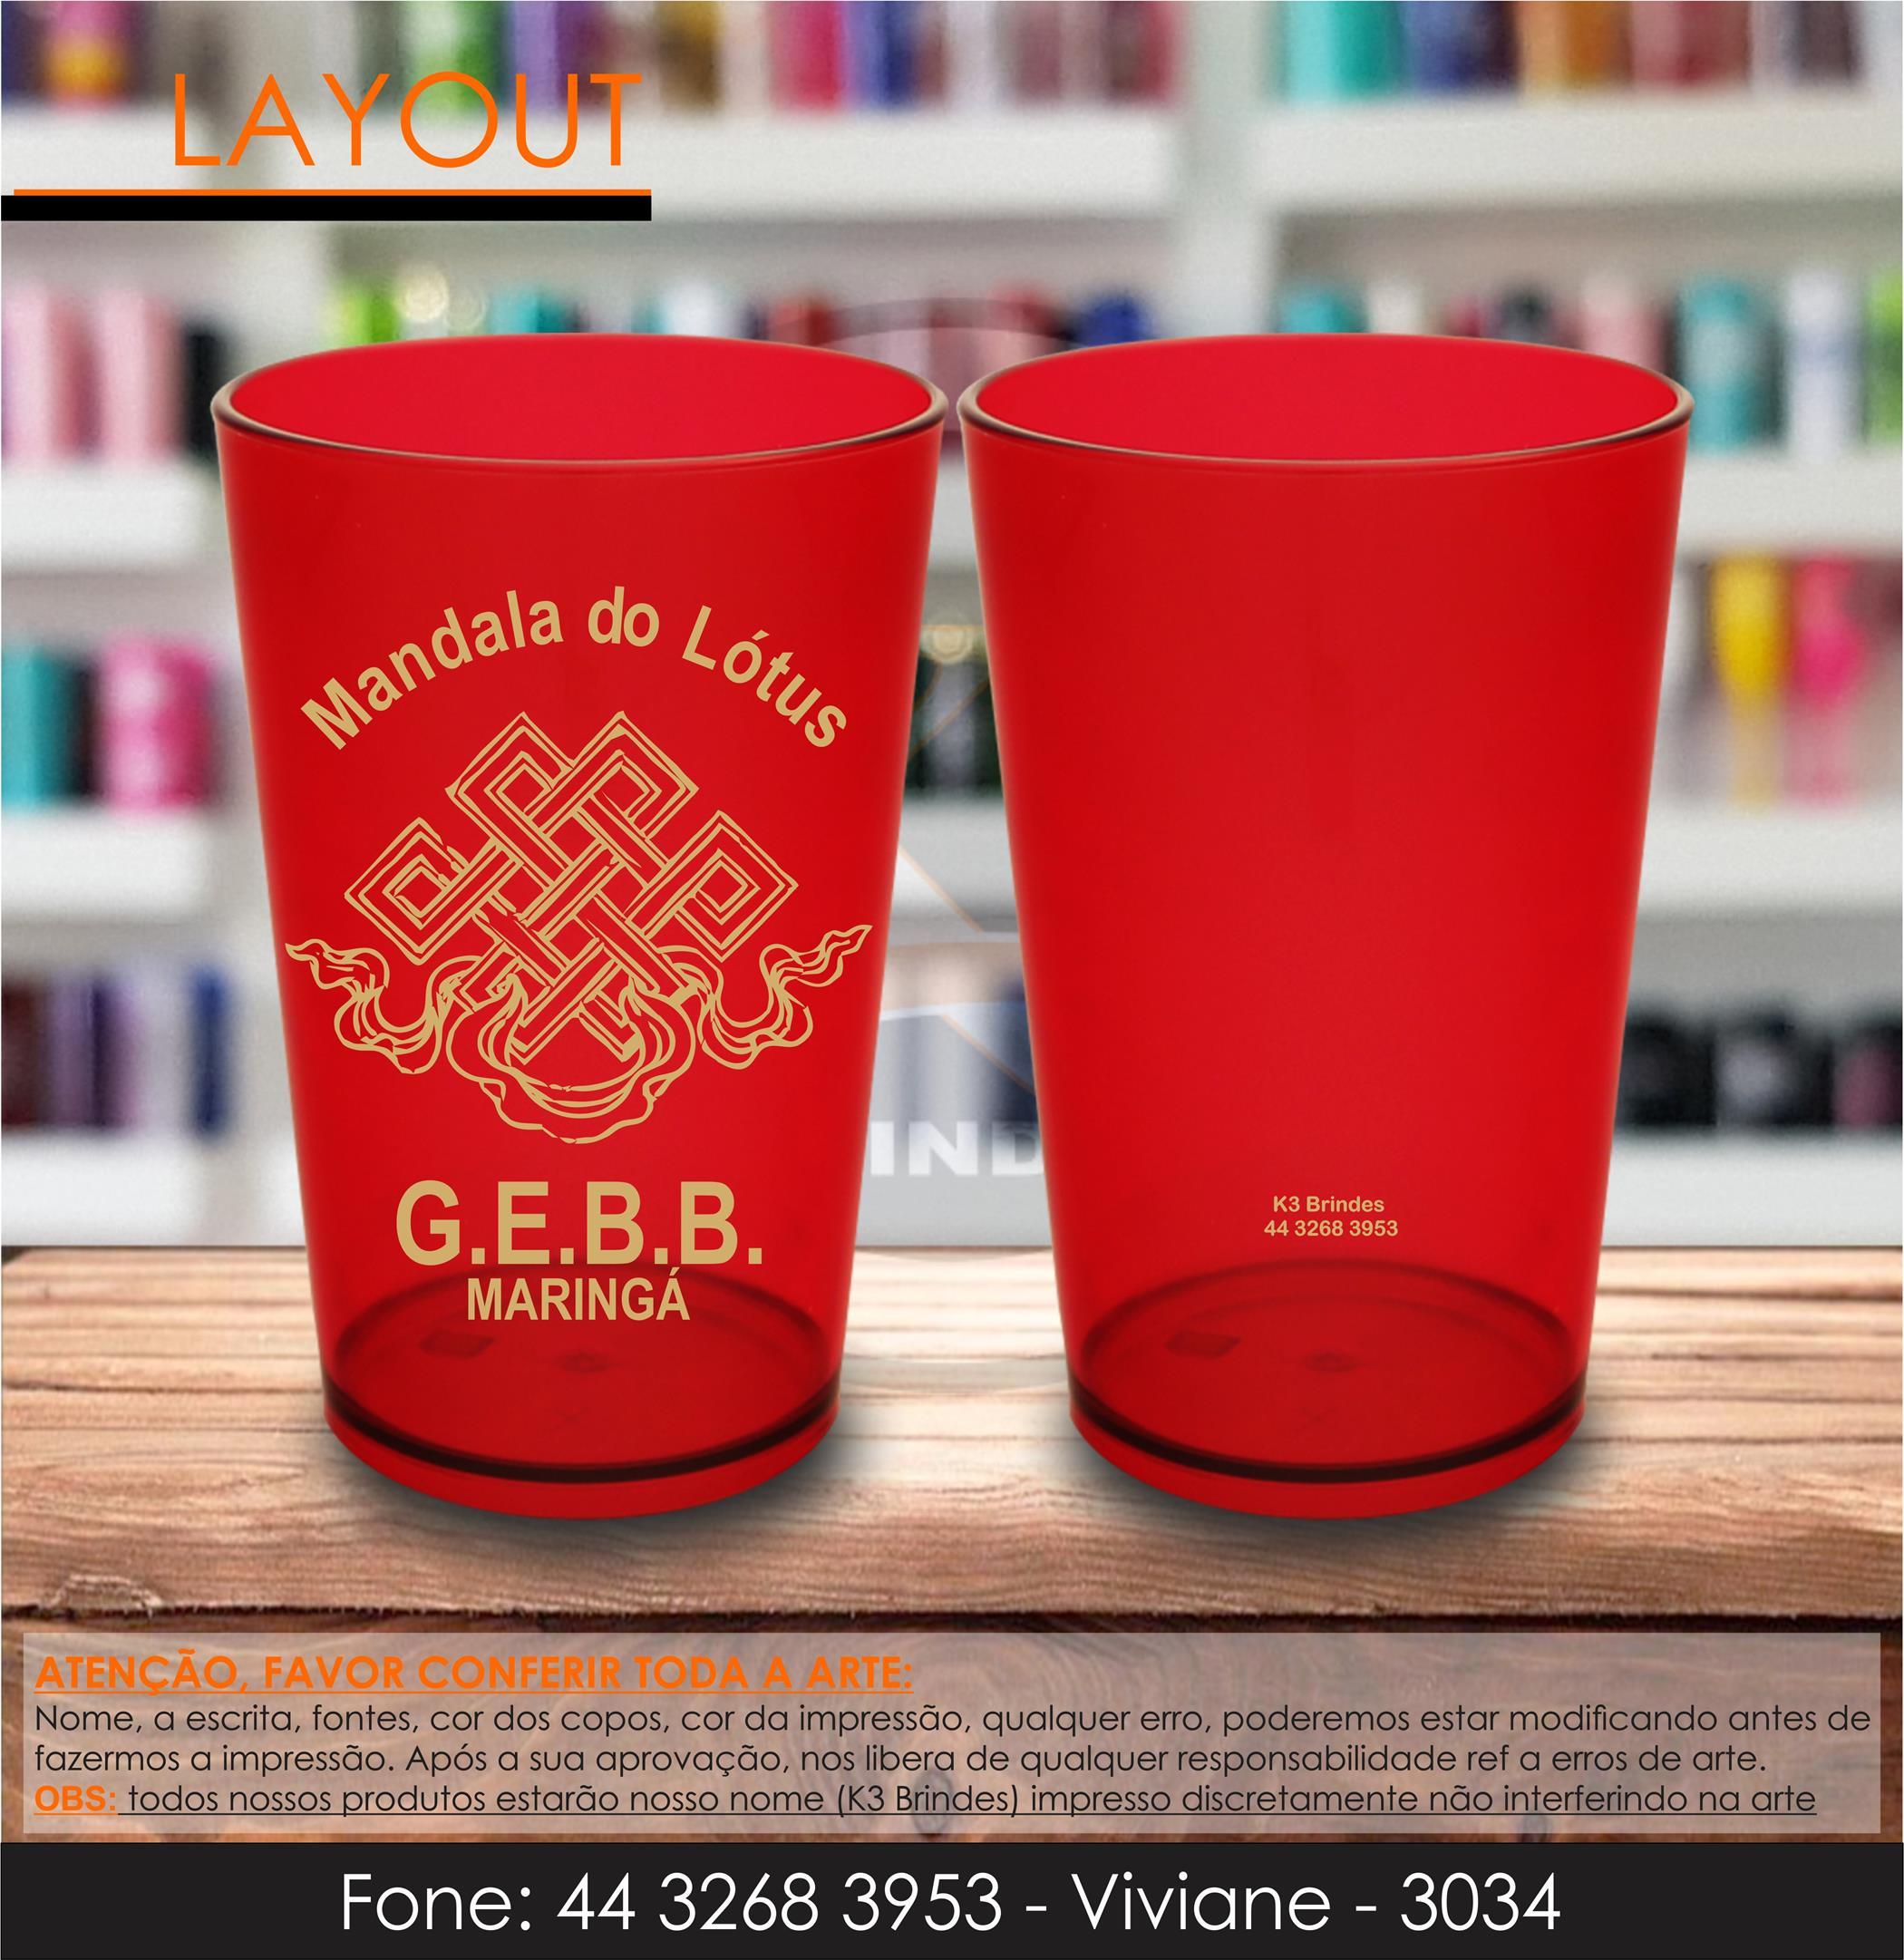 3034 - caldereta vermelha - mandala lótus